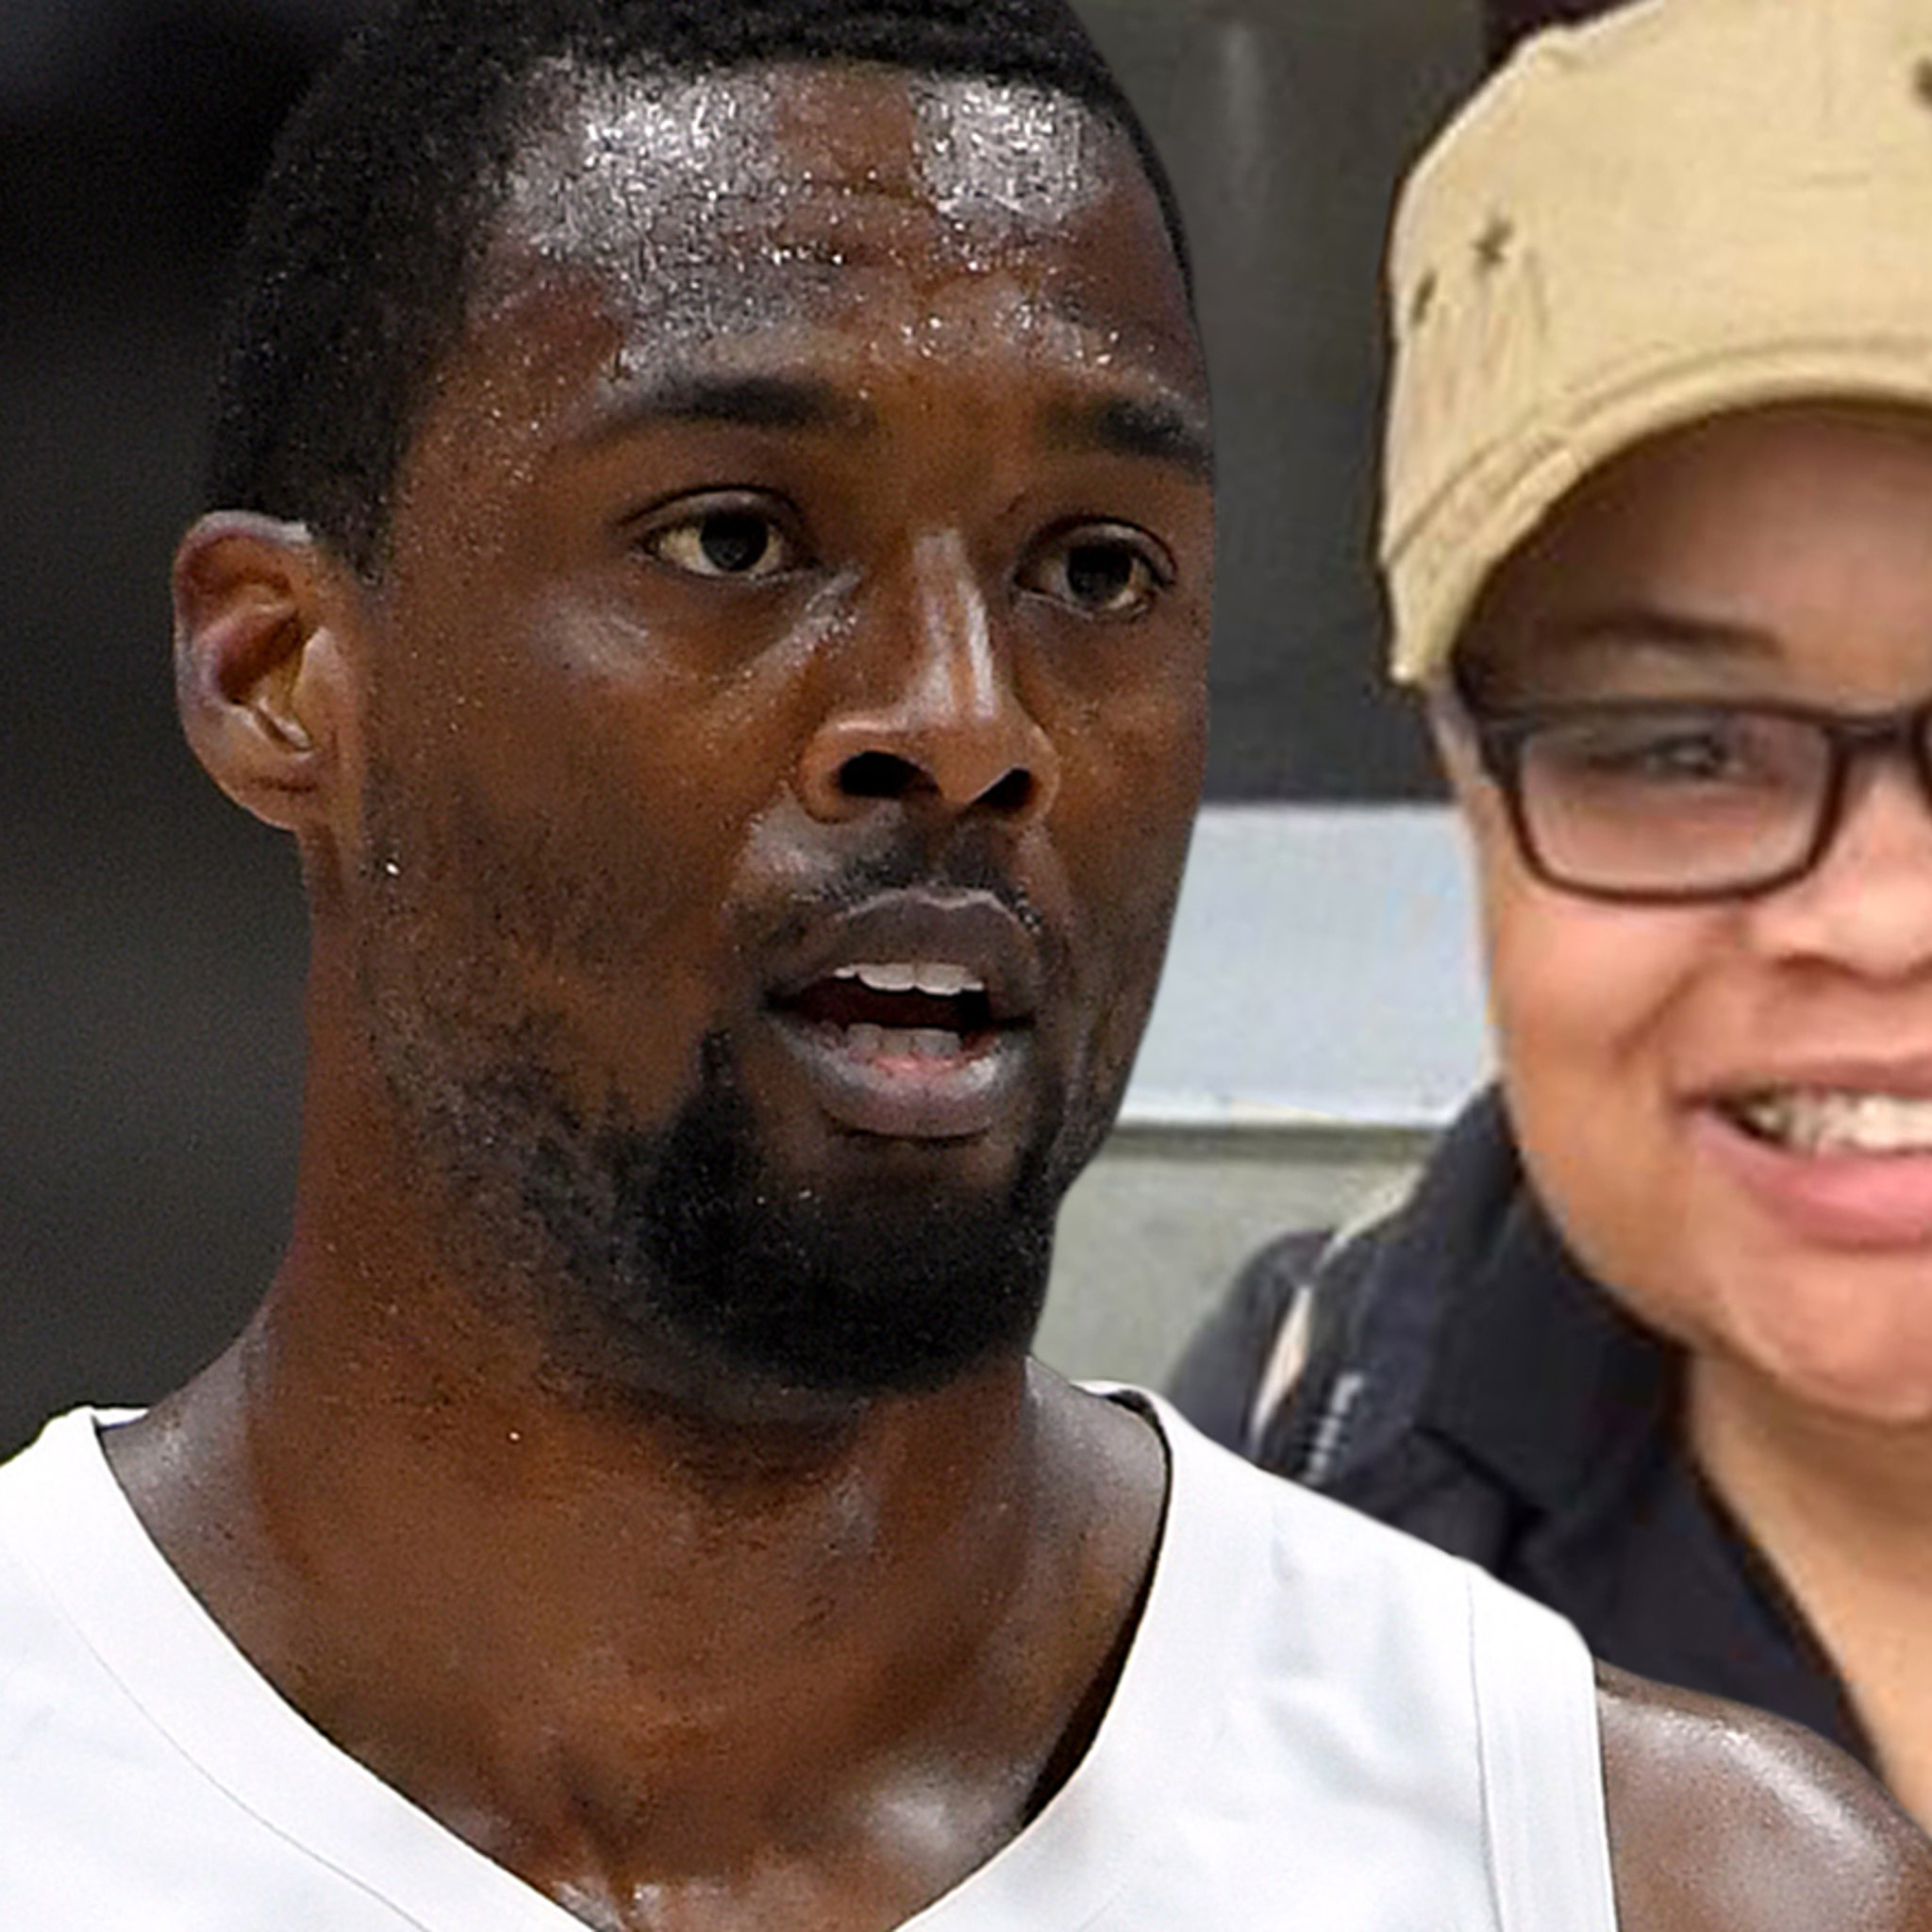 NBA's Harrison Barnes to Pay for Atatiana Jefferson Funeral